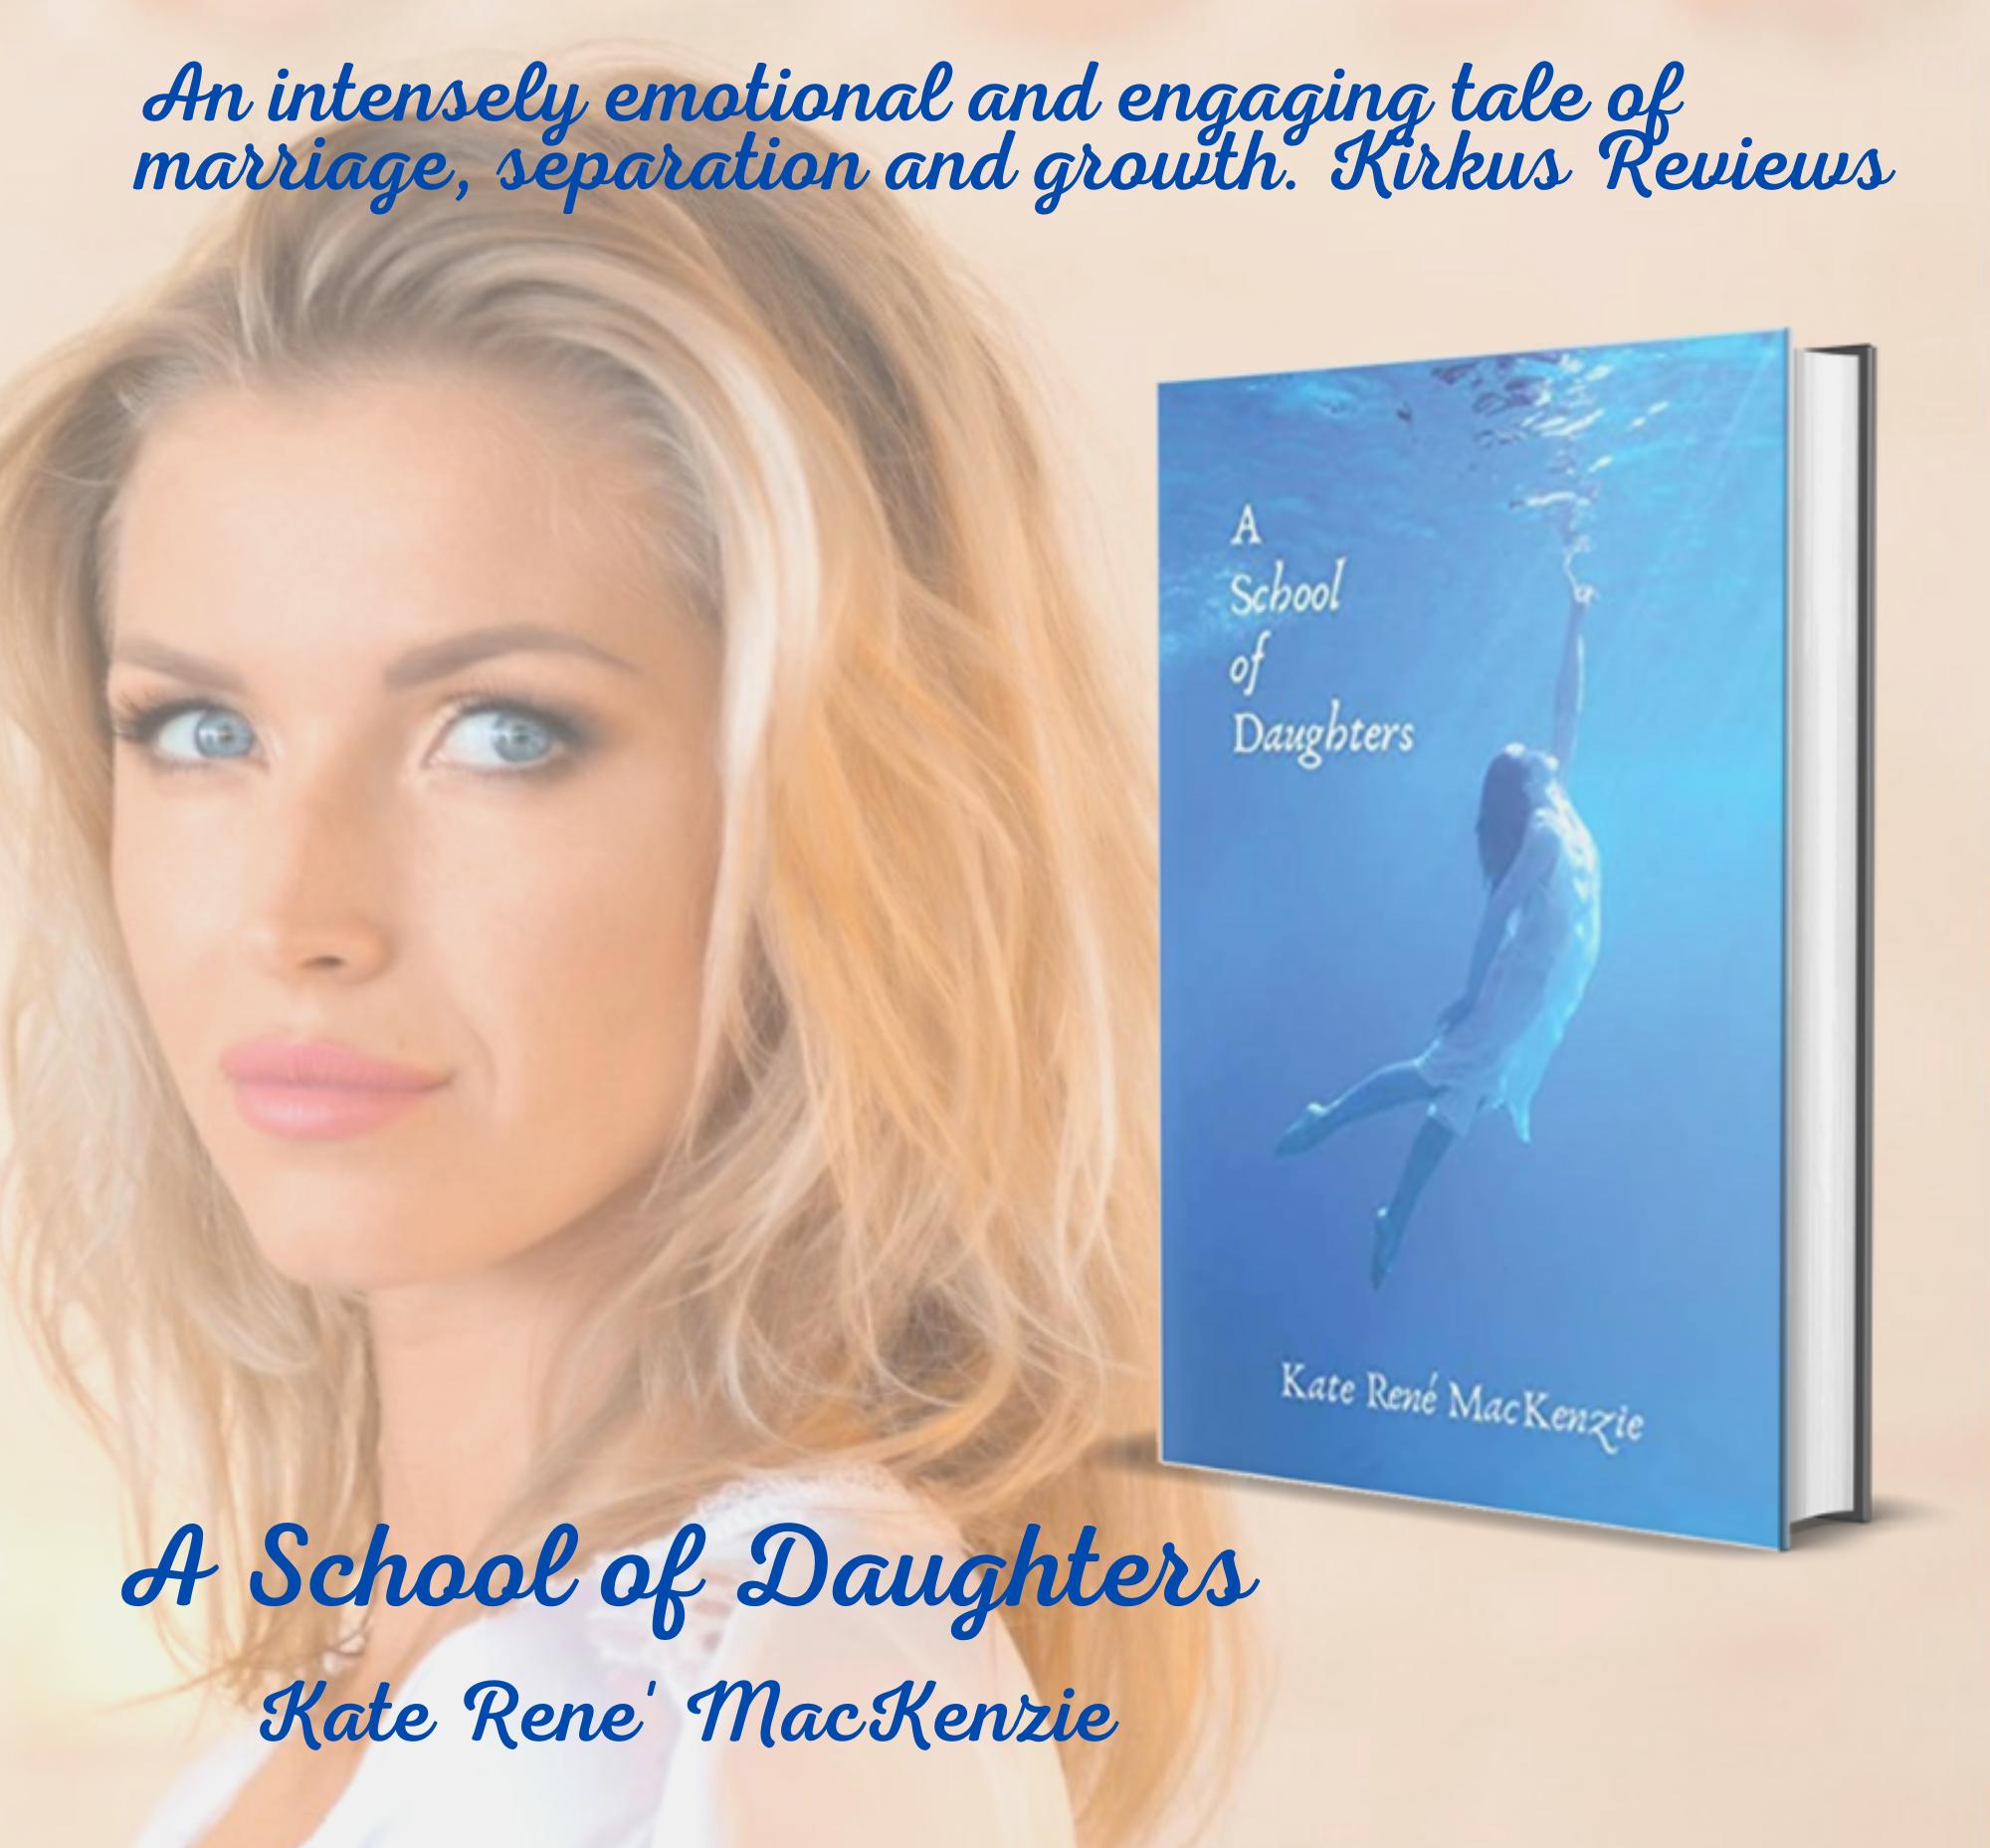 A School of Daughters standing book